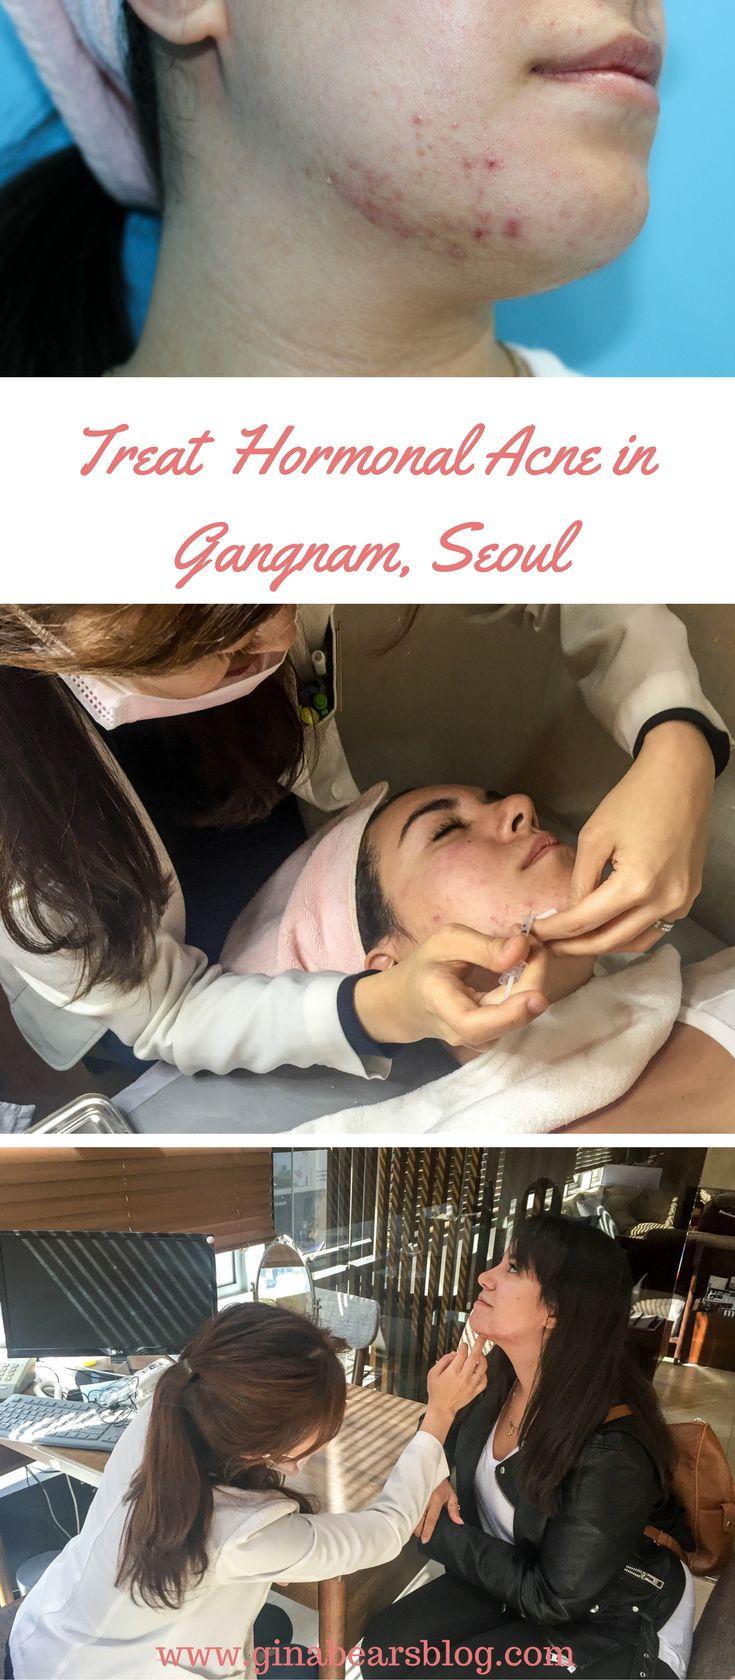 Jessner Peel and Pimple Extraction with Eunogo http://ginabearsblog.com/2017/10/jessner-peel-pimple-extraction-eunogo/